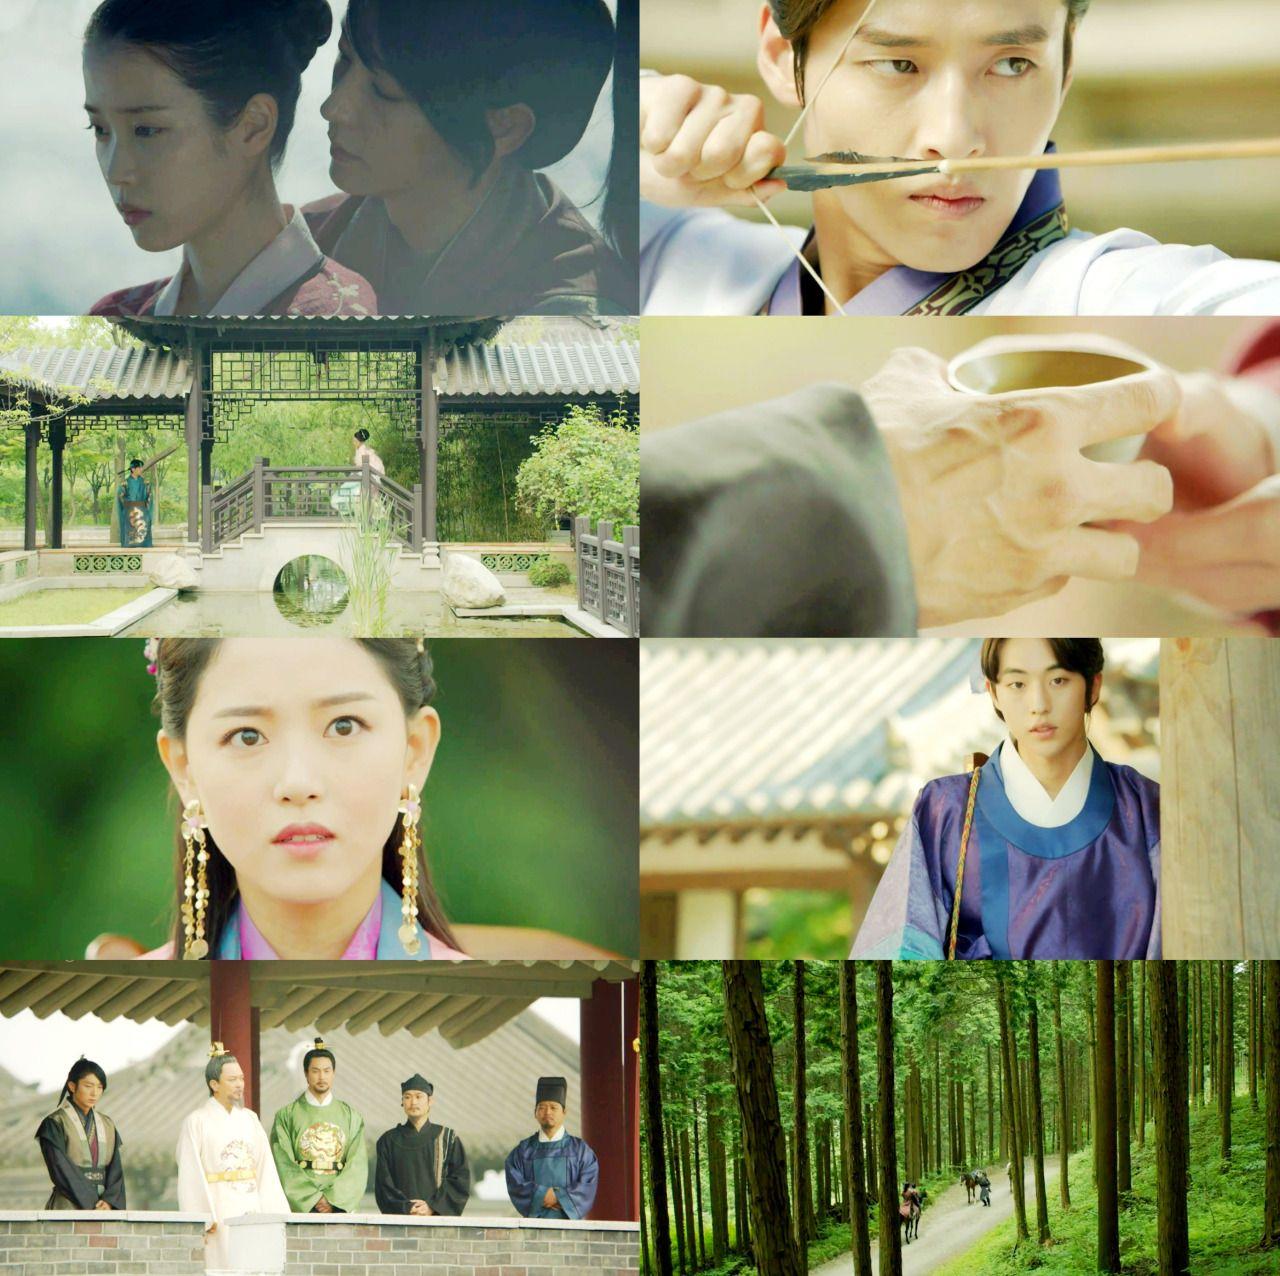 Watch Scarlet Heart Ryeo Same Time as Koreas Telecast